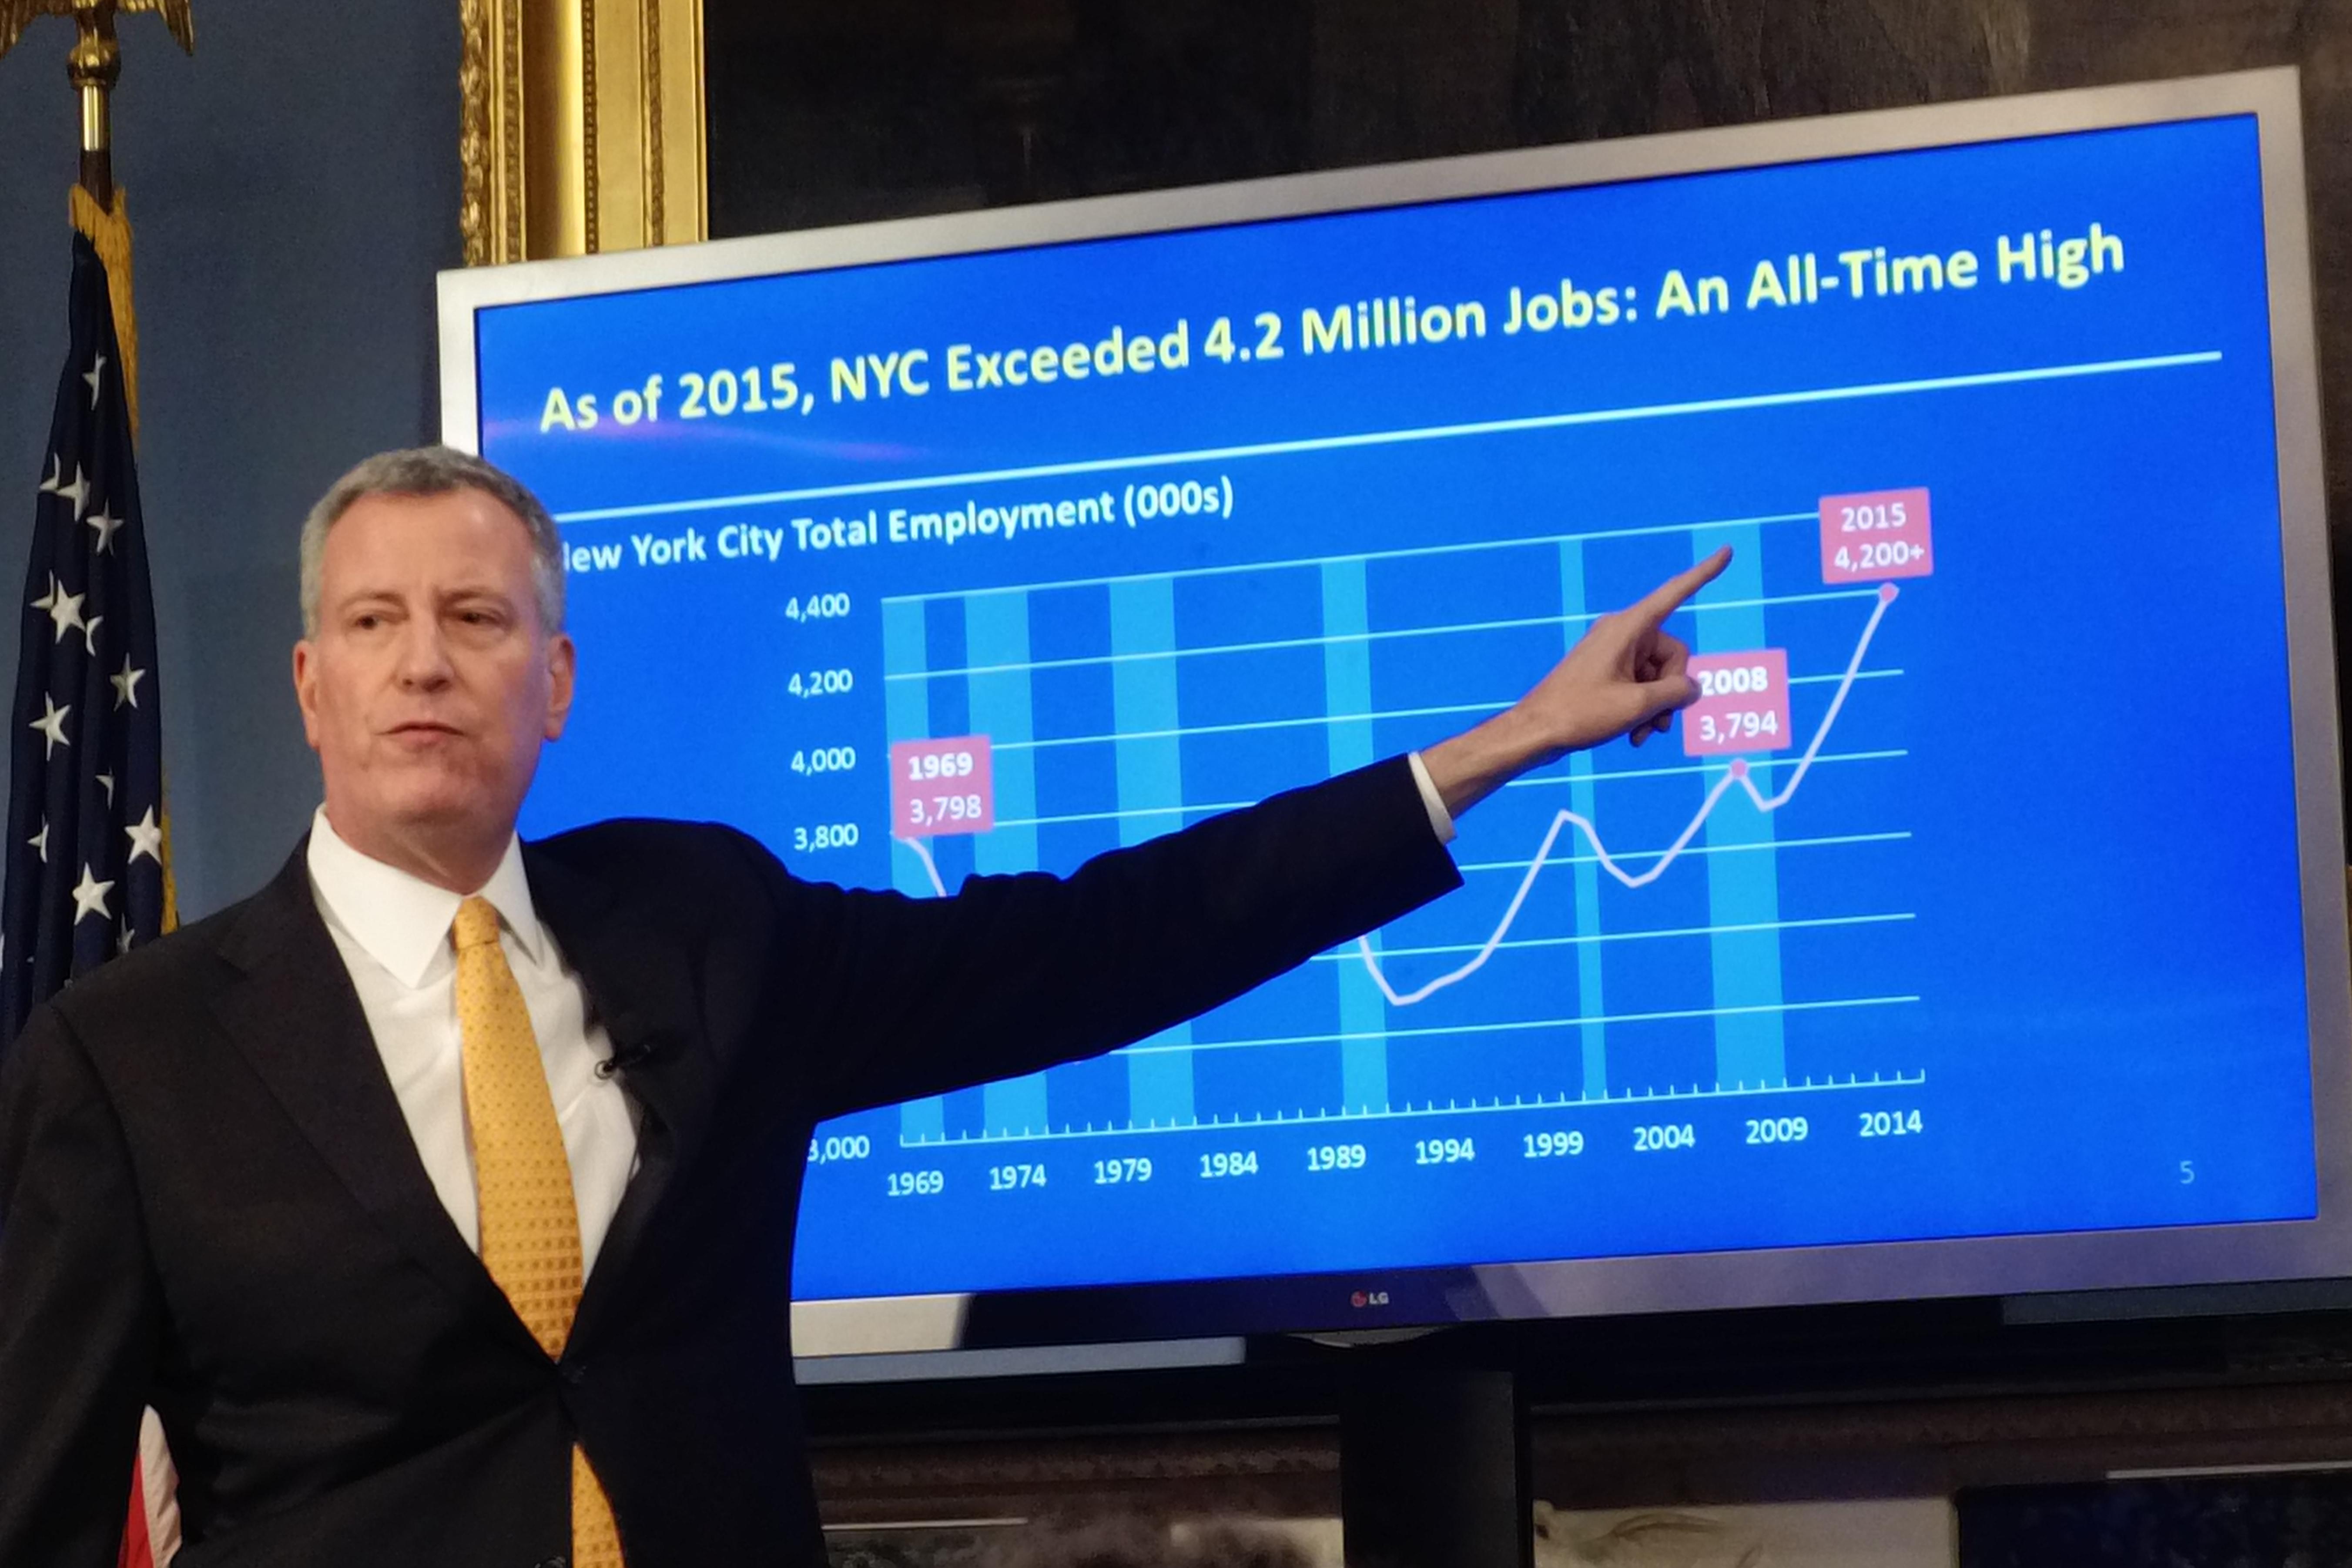 Mayor Bill de Blasio at his budget presentation in January.